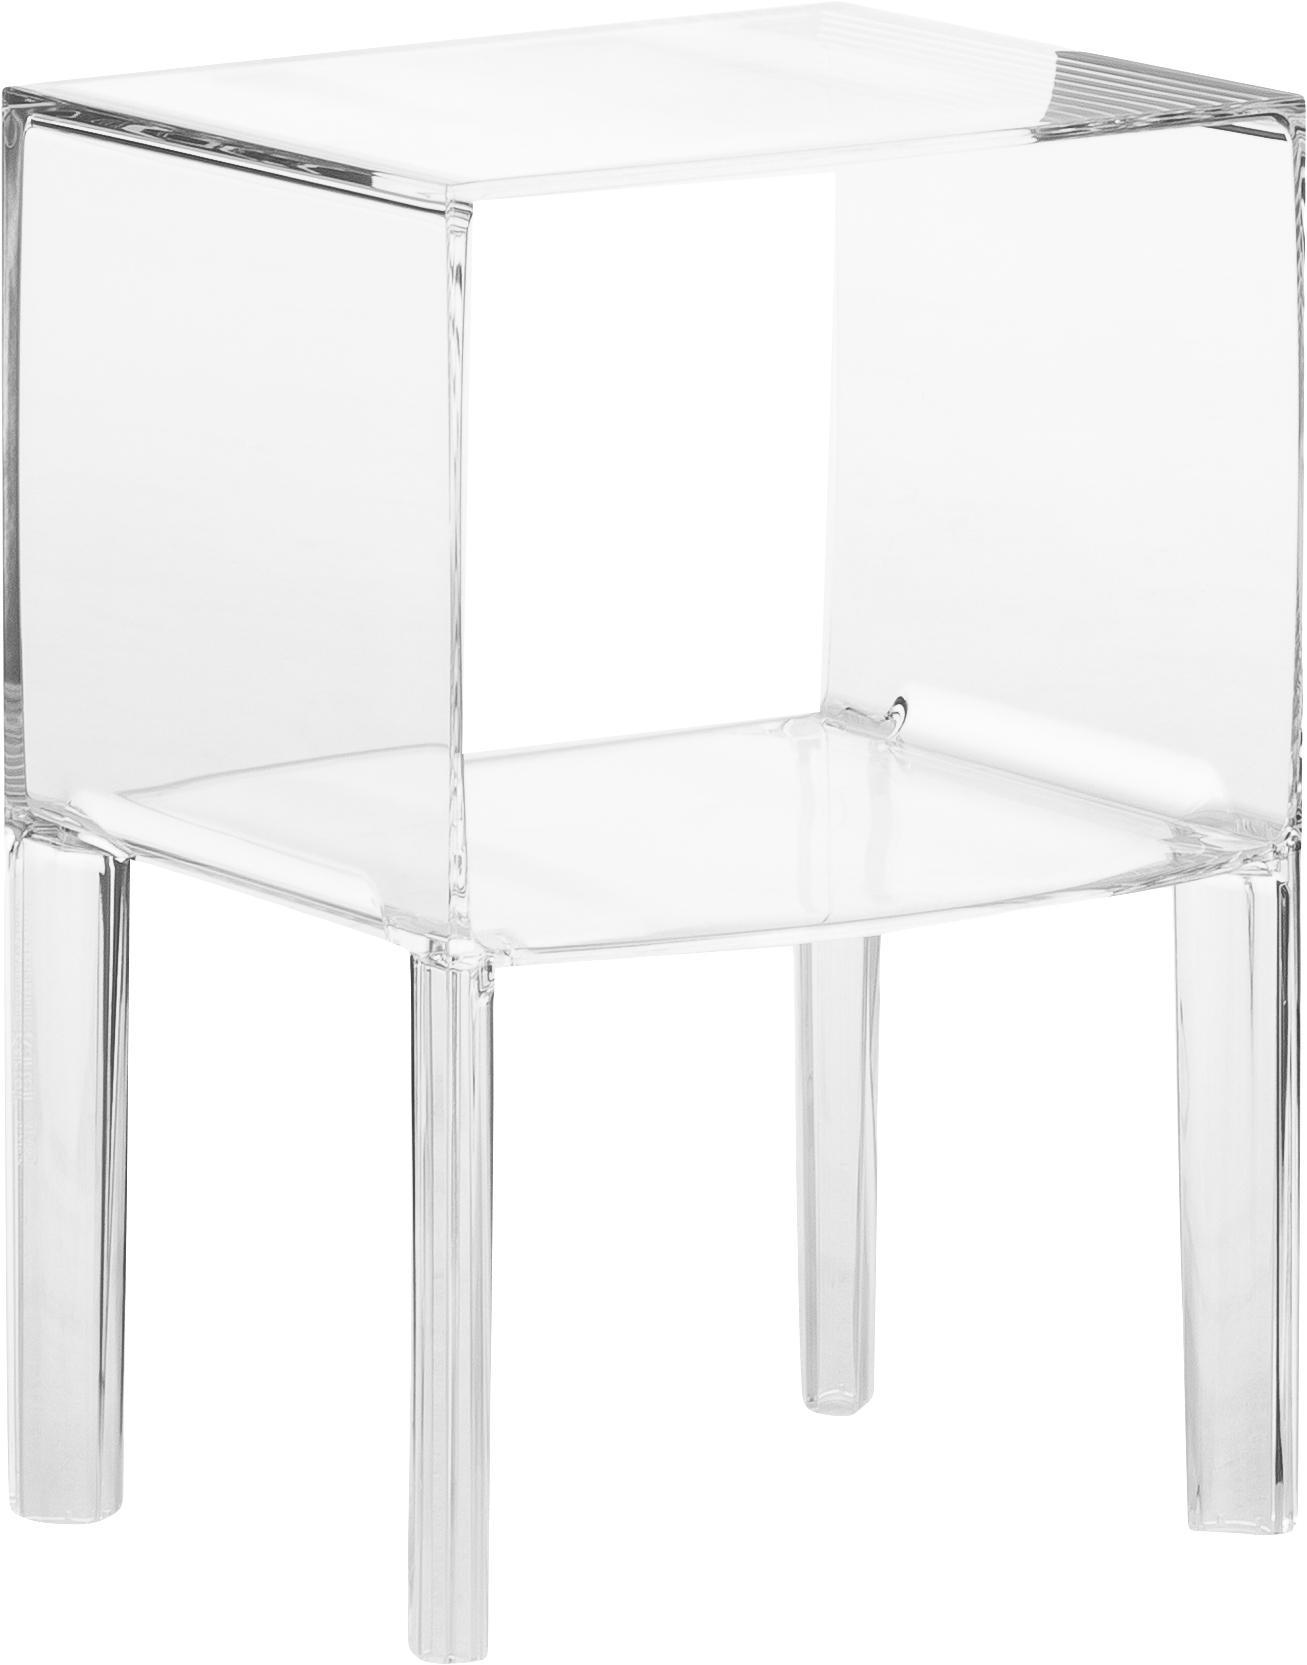 Mesilla de noche Ghost Buster, Plástico, Transparente, An 40 x Al 57 cm